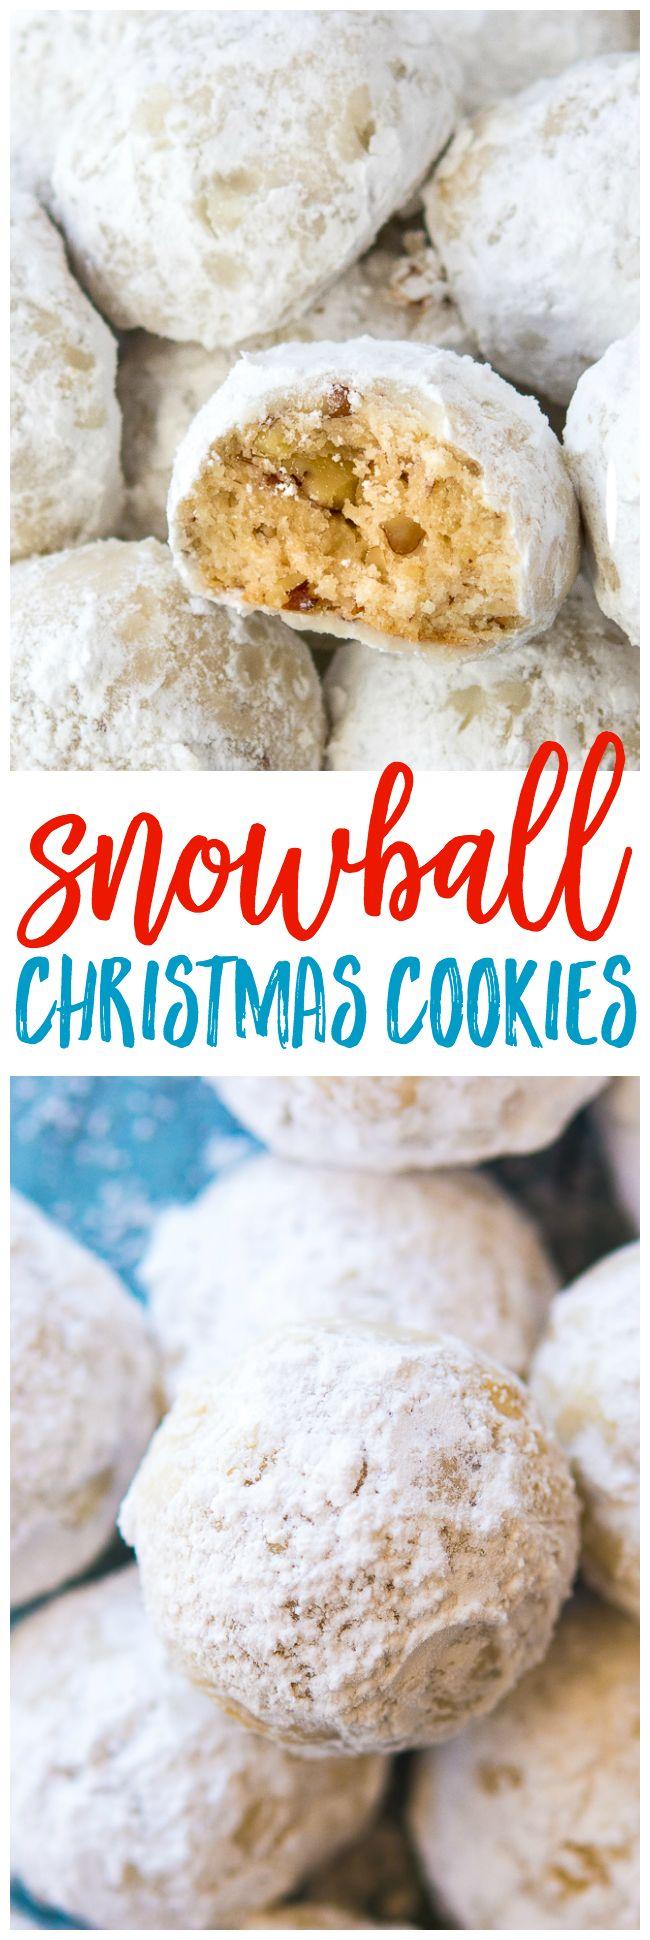 Snowball Cookies - Snowball Christmas Cookies - Snowballs - Pecan Snowballs #ChristmasCookies #SnowballCookies